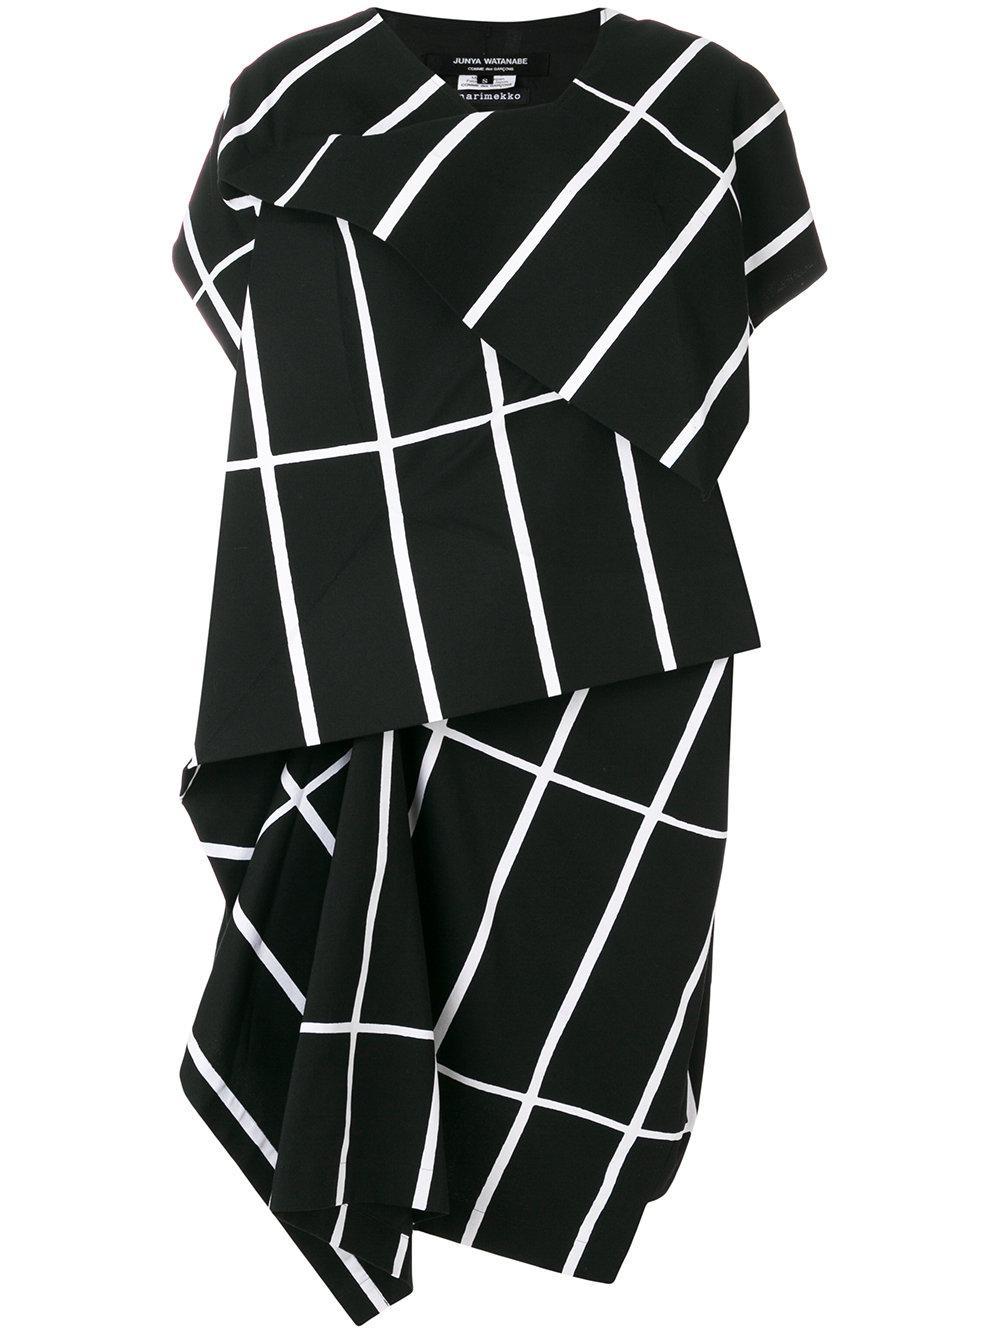 Junya Watanabe geometric print jumper - Gris 5cPkjjaG